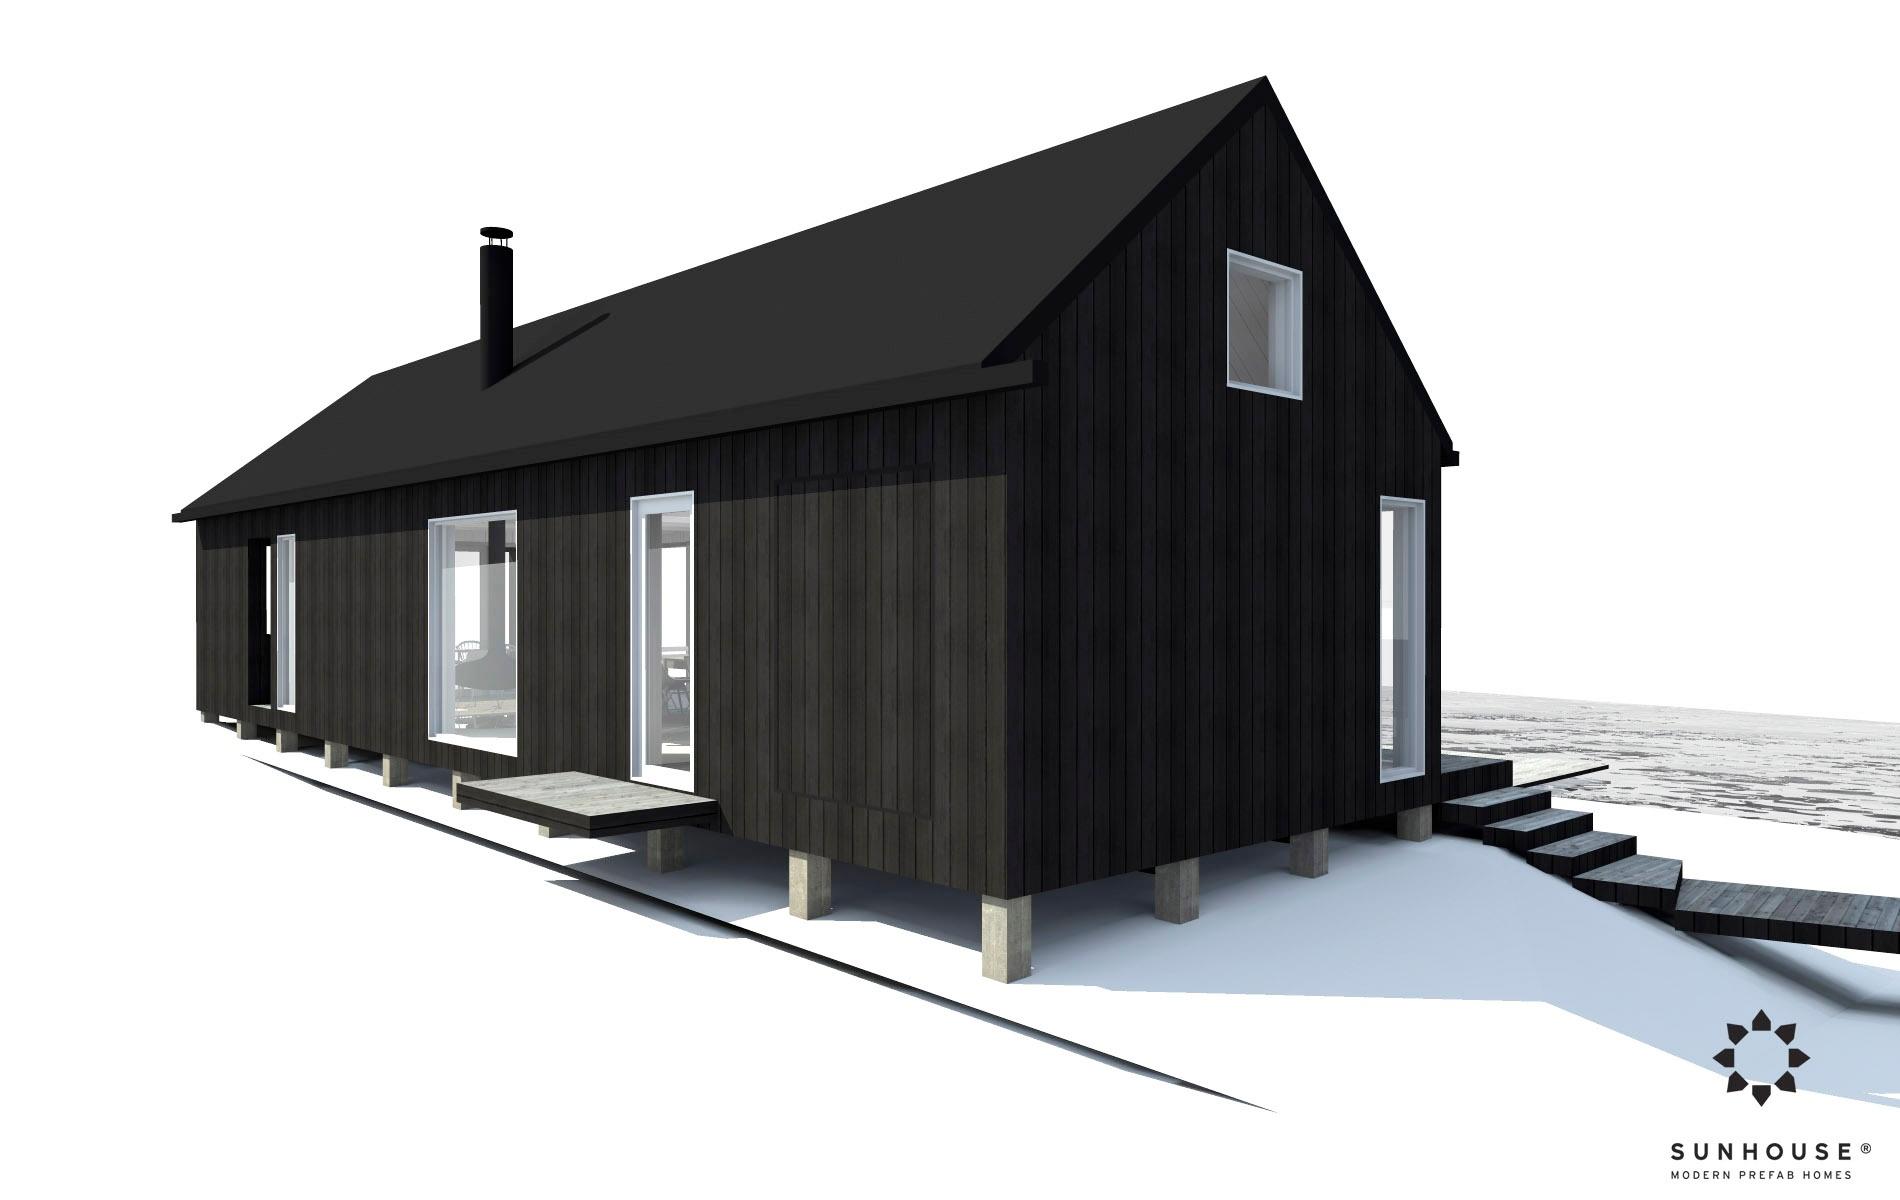 Sunhouse moderni mökki S1601_ulkoa(4)